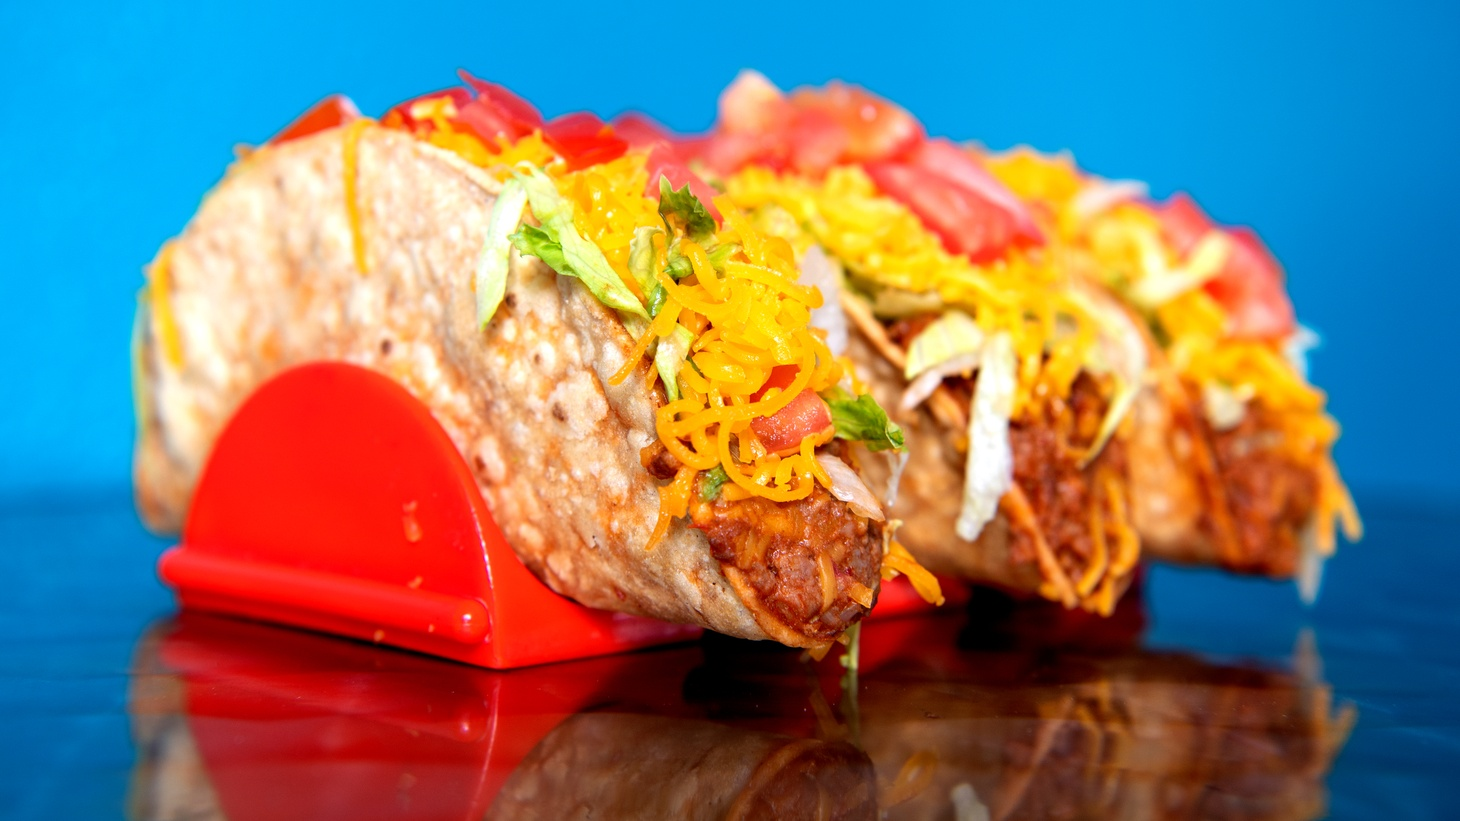 Naugles' original beef taco.